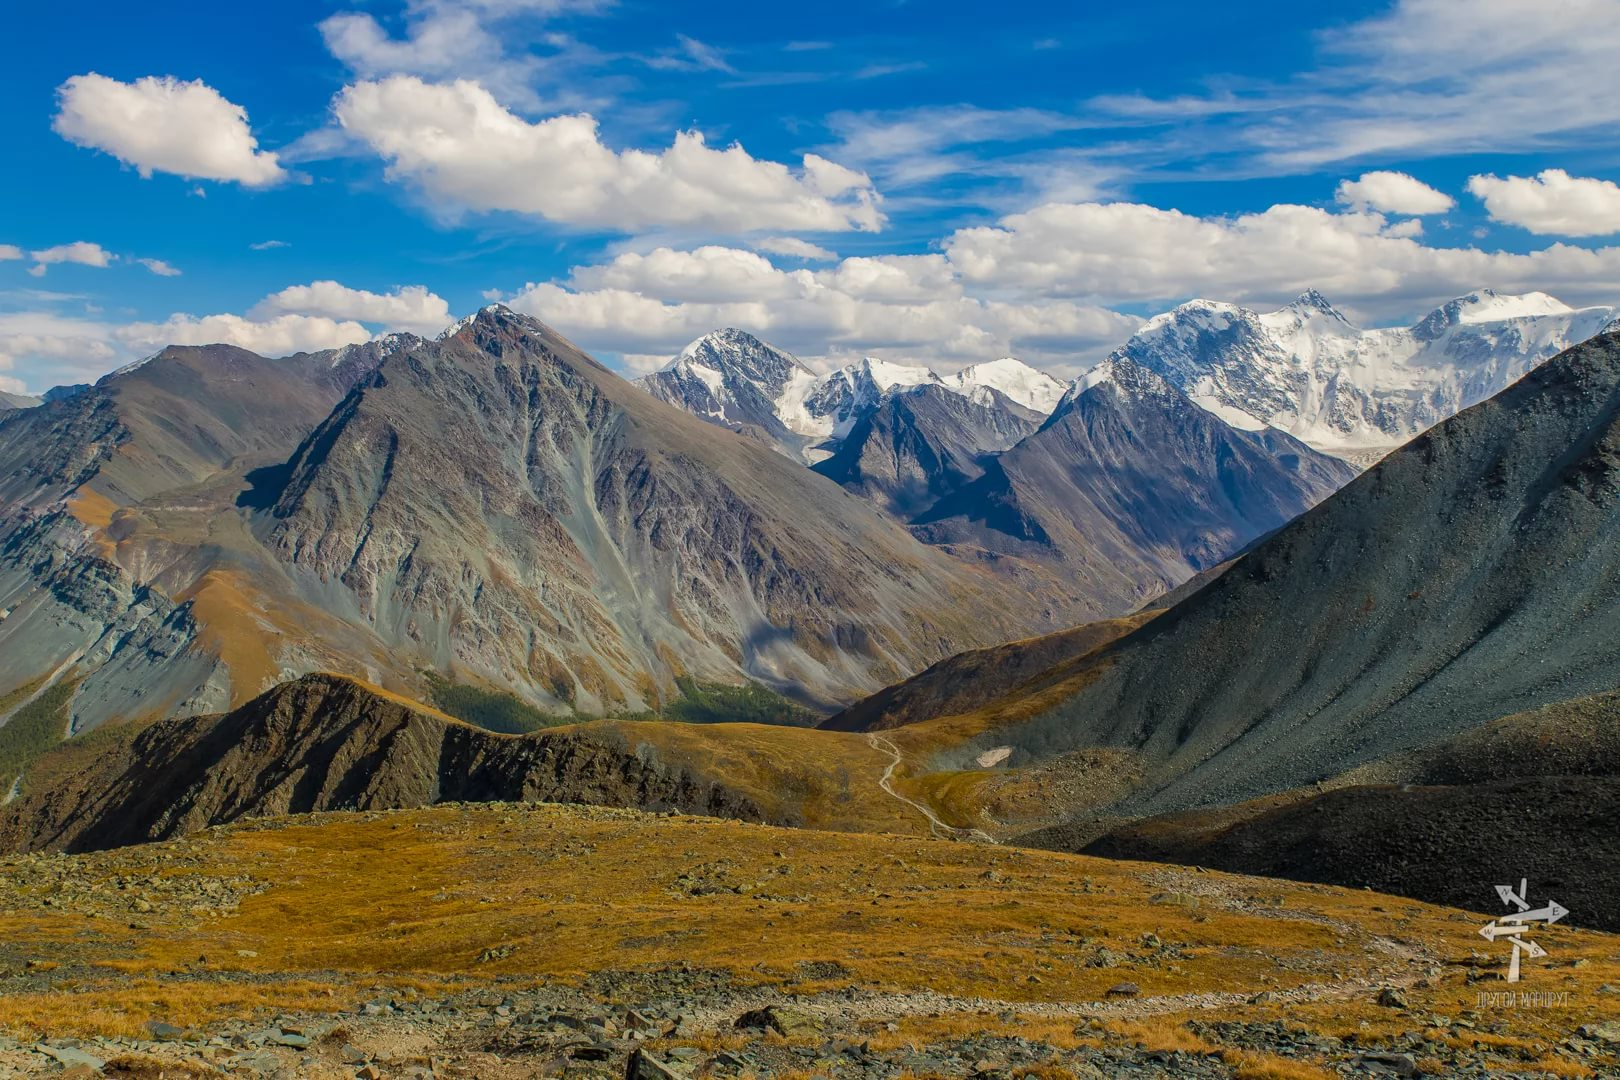 24 - 10 locais no Altay que vale a pena visitar